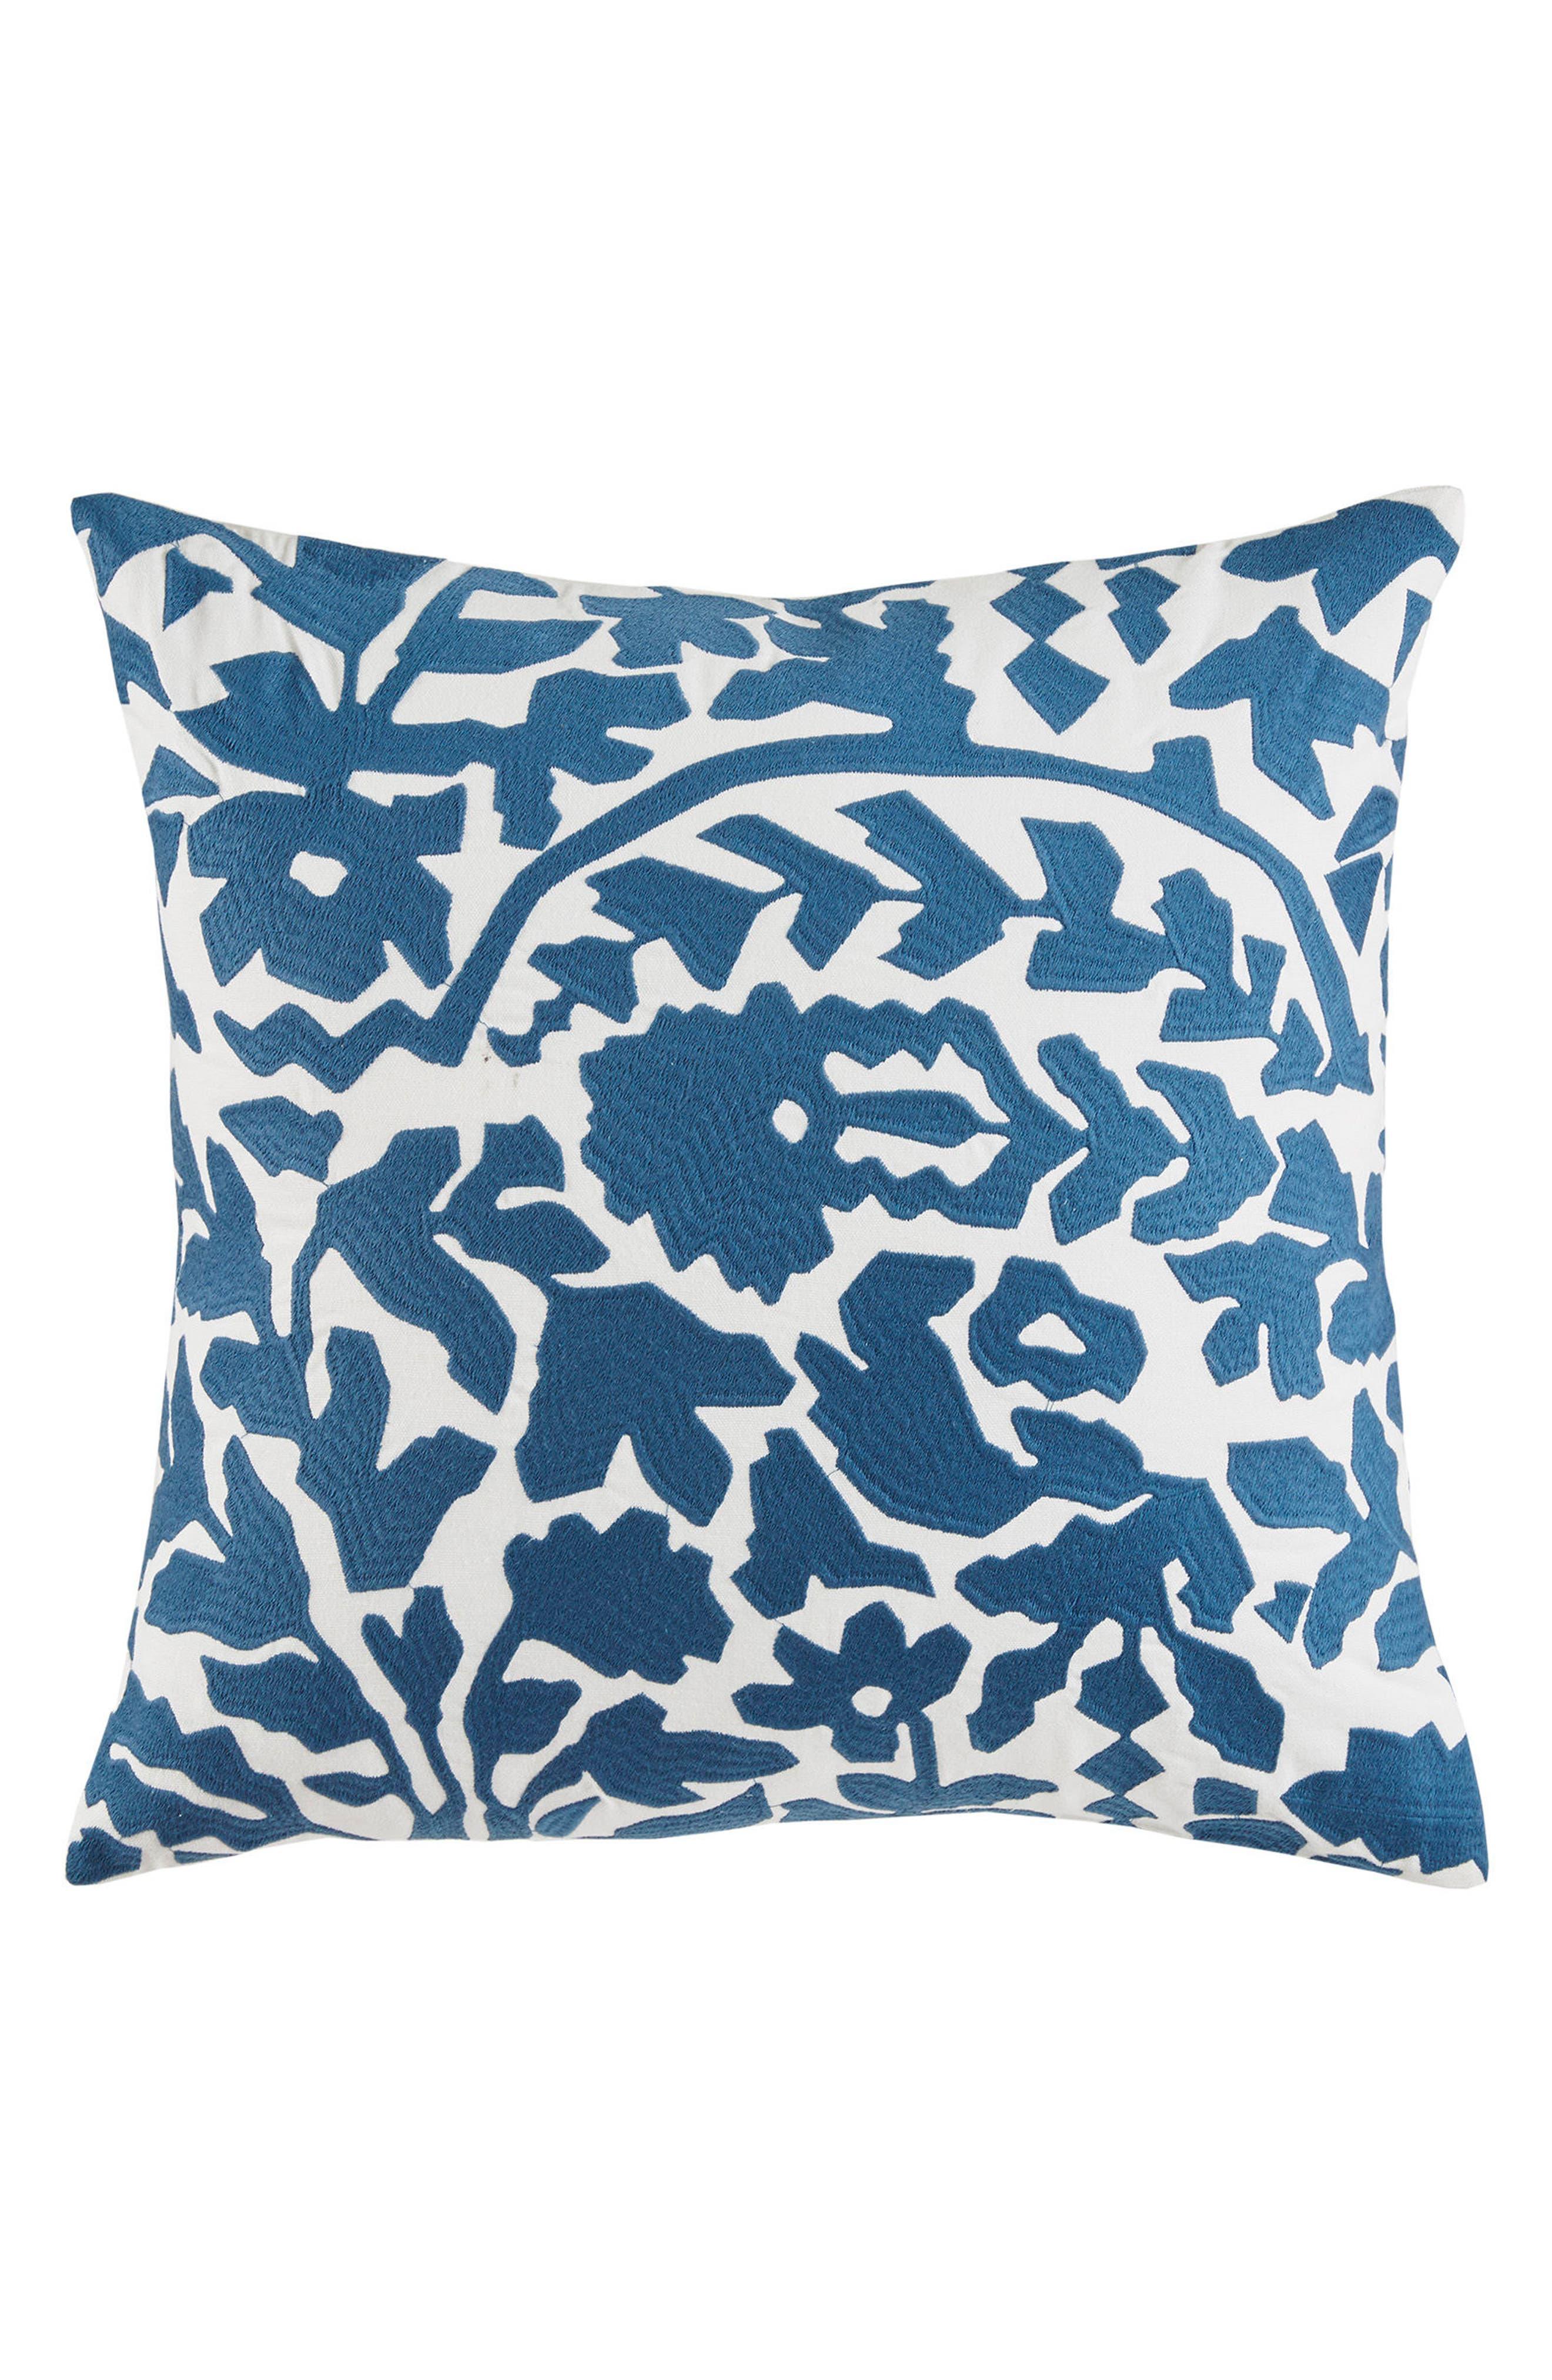 Oaxaca Floral Accent Pillow,                             Main thumbnail 1, color,                             410